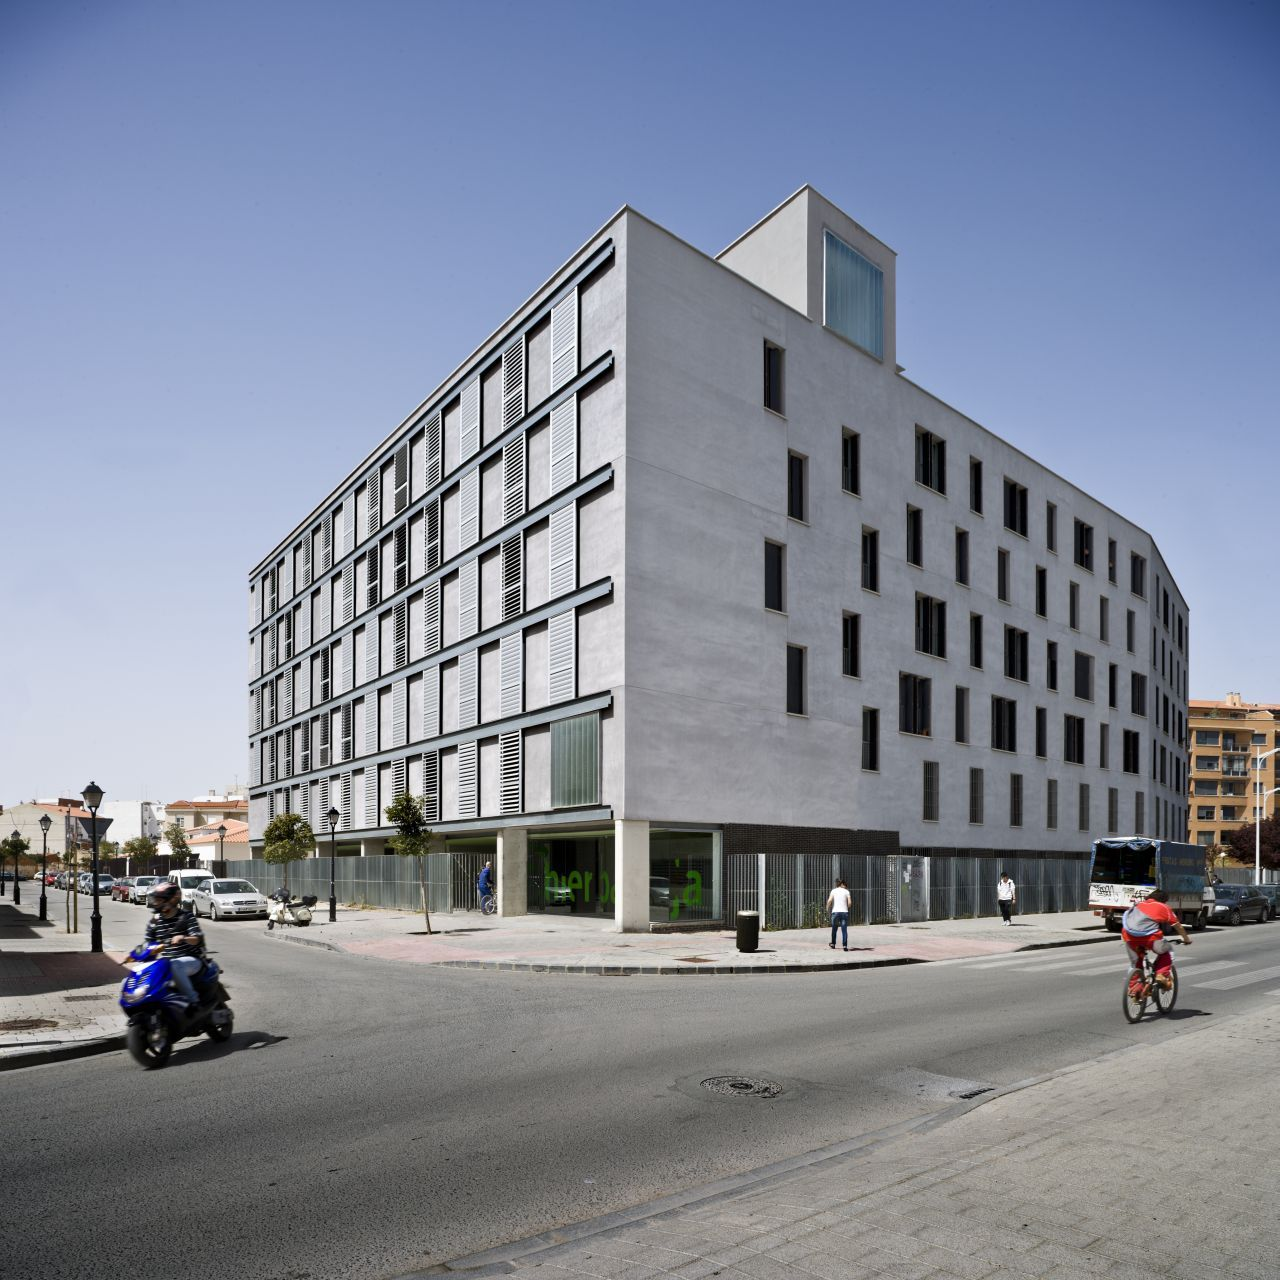 al4 _ 56 Habitações Sociais VPO / Burgos & Garrido arquitectos, Ángel Baltanás